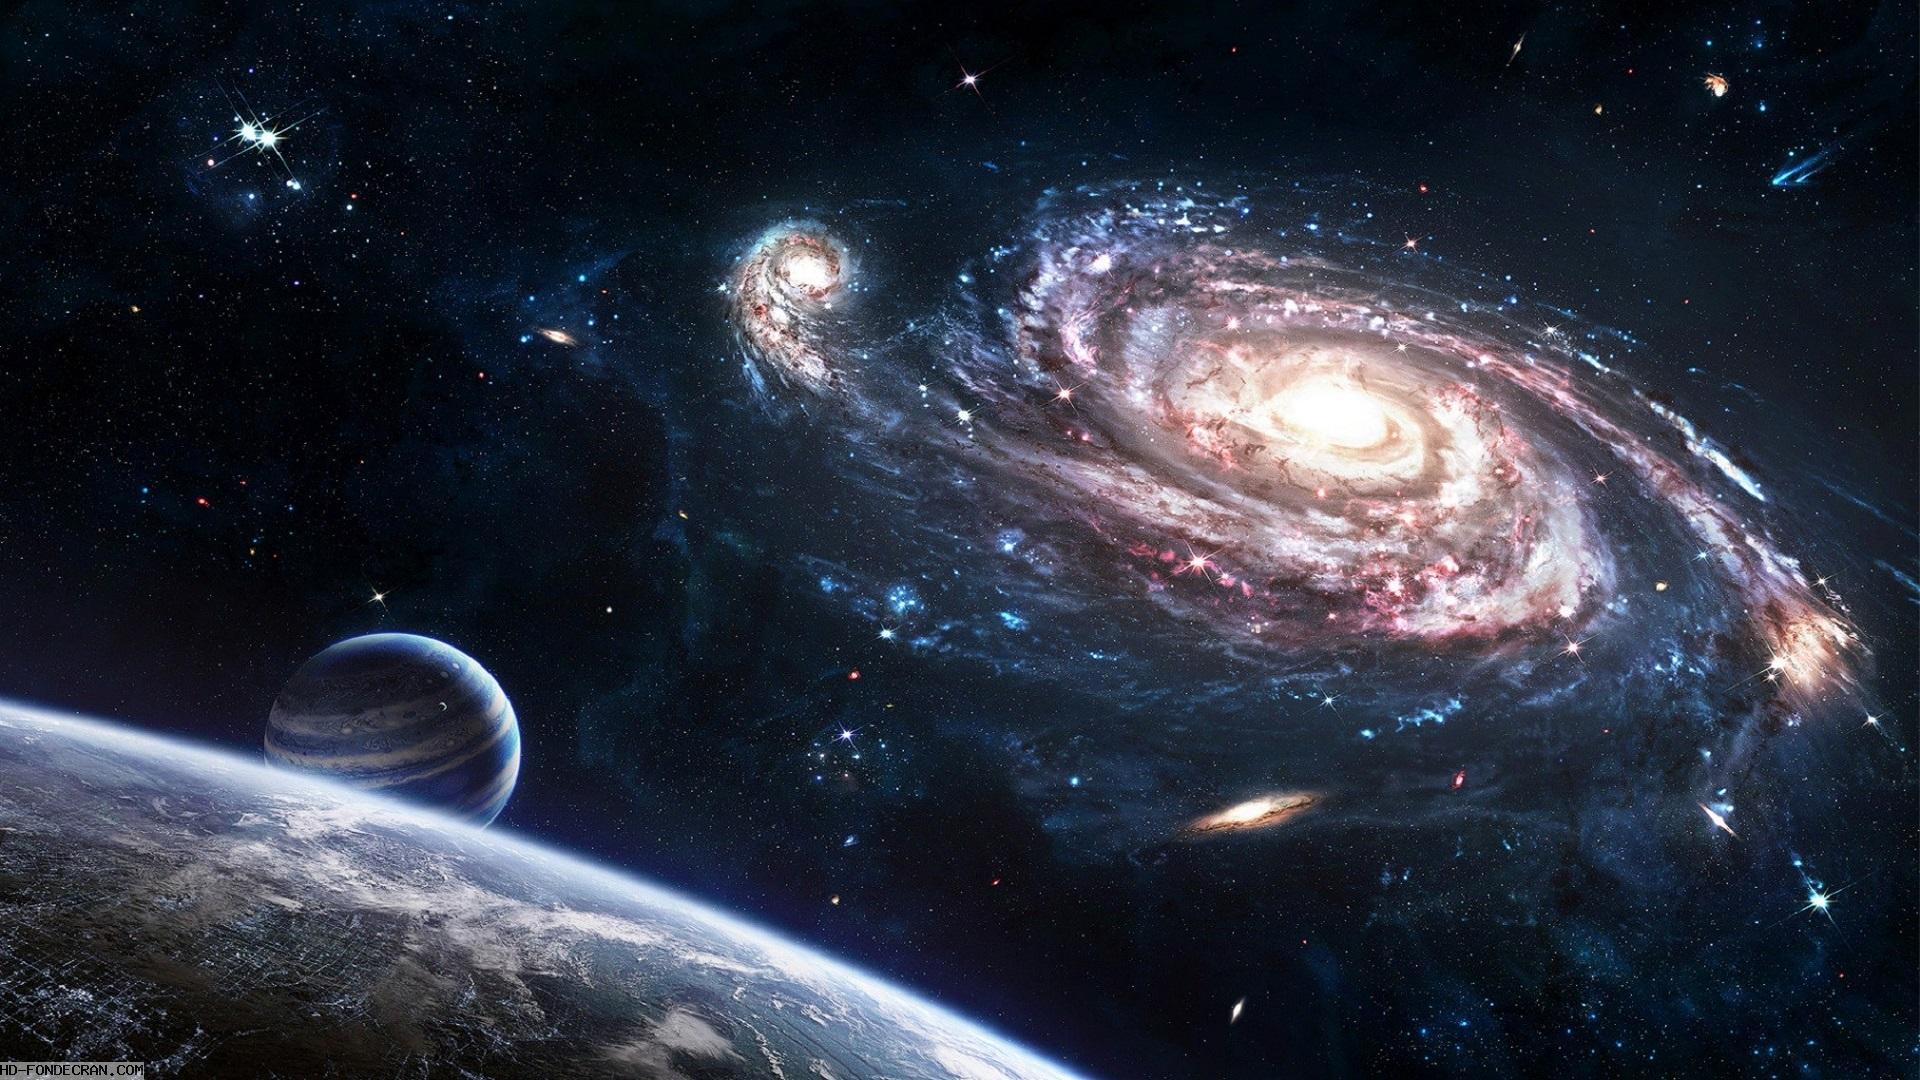 fond d'écran hd espace de la terre gratuit